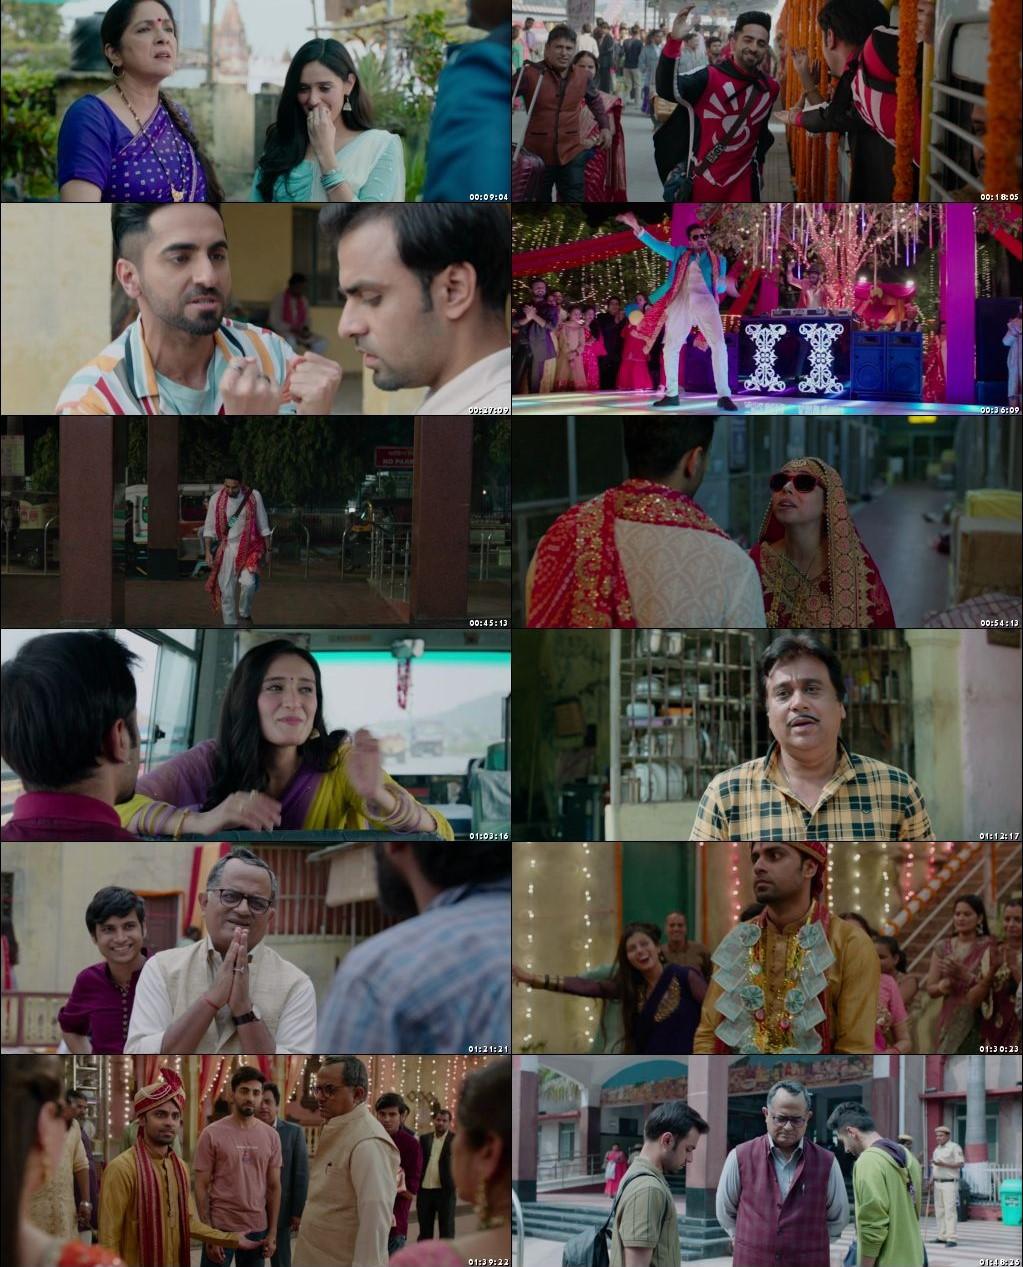 Shubh Mangal Zyada Saavdhan 2020 Full Hindi Movie Online Watch